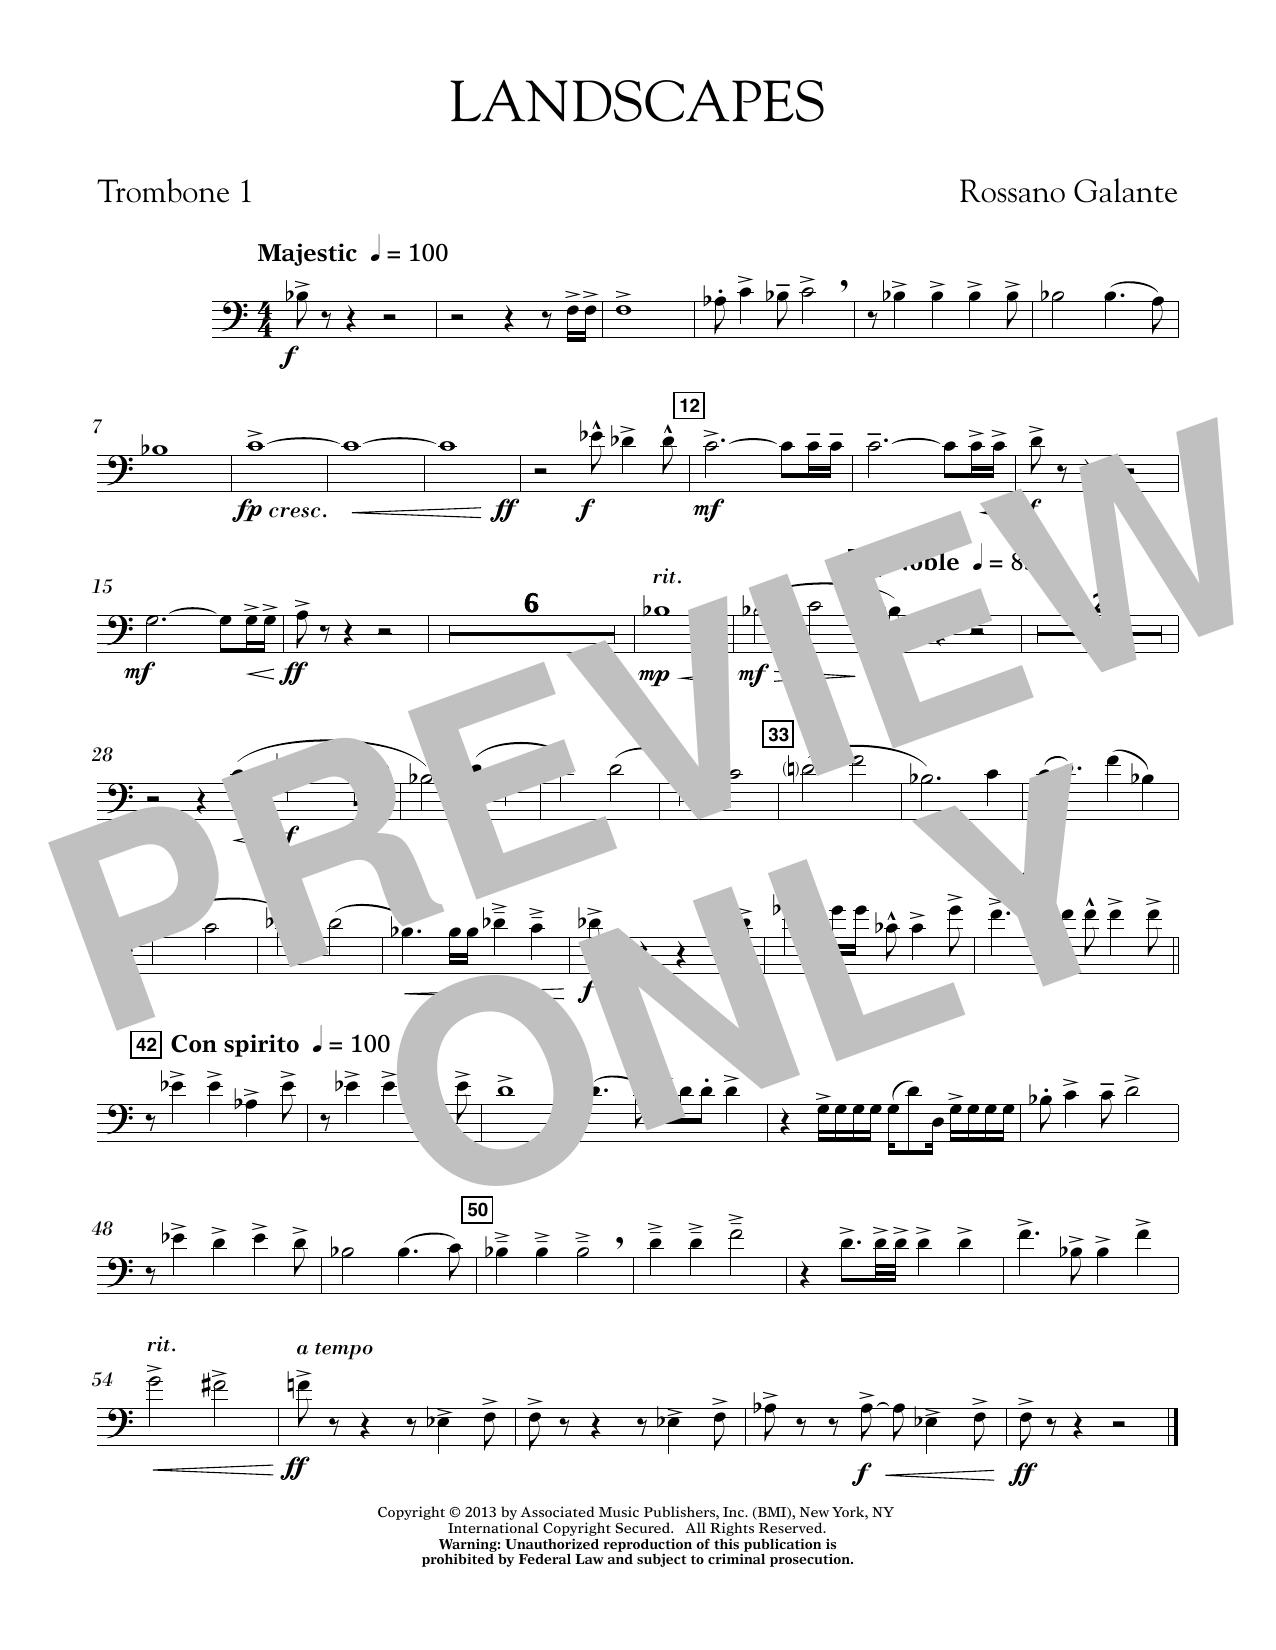 Rosanno Galante Landscapes - Trombone 1 sheet music notes printable PDF score